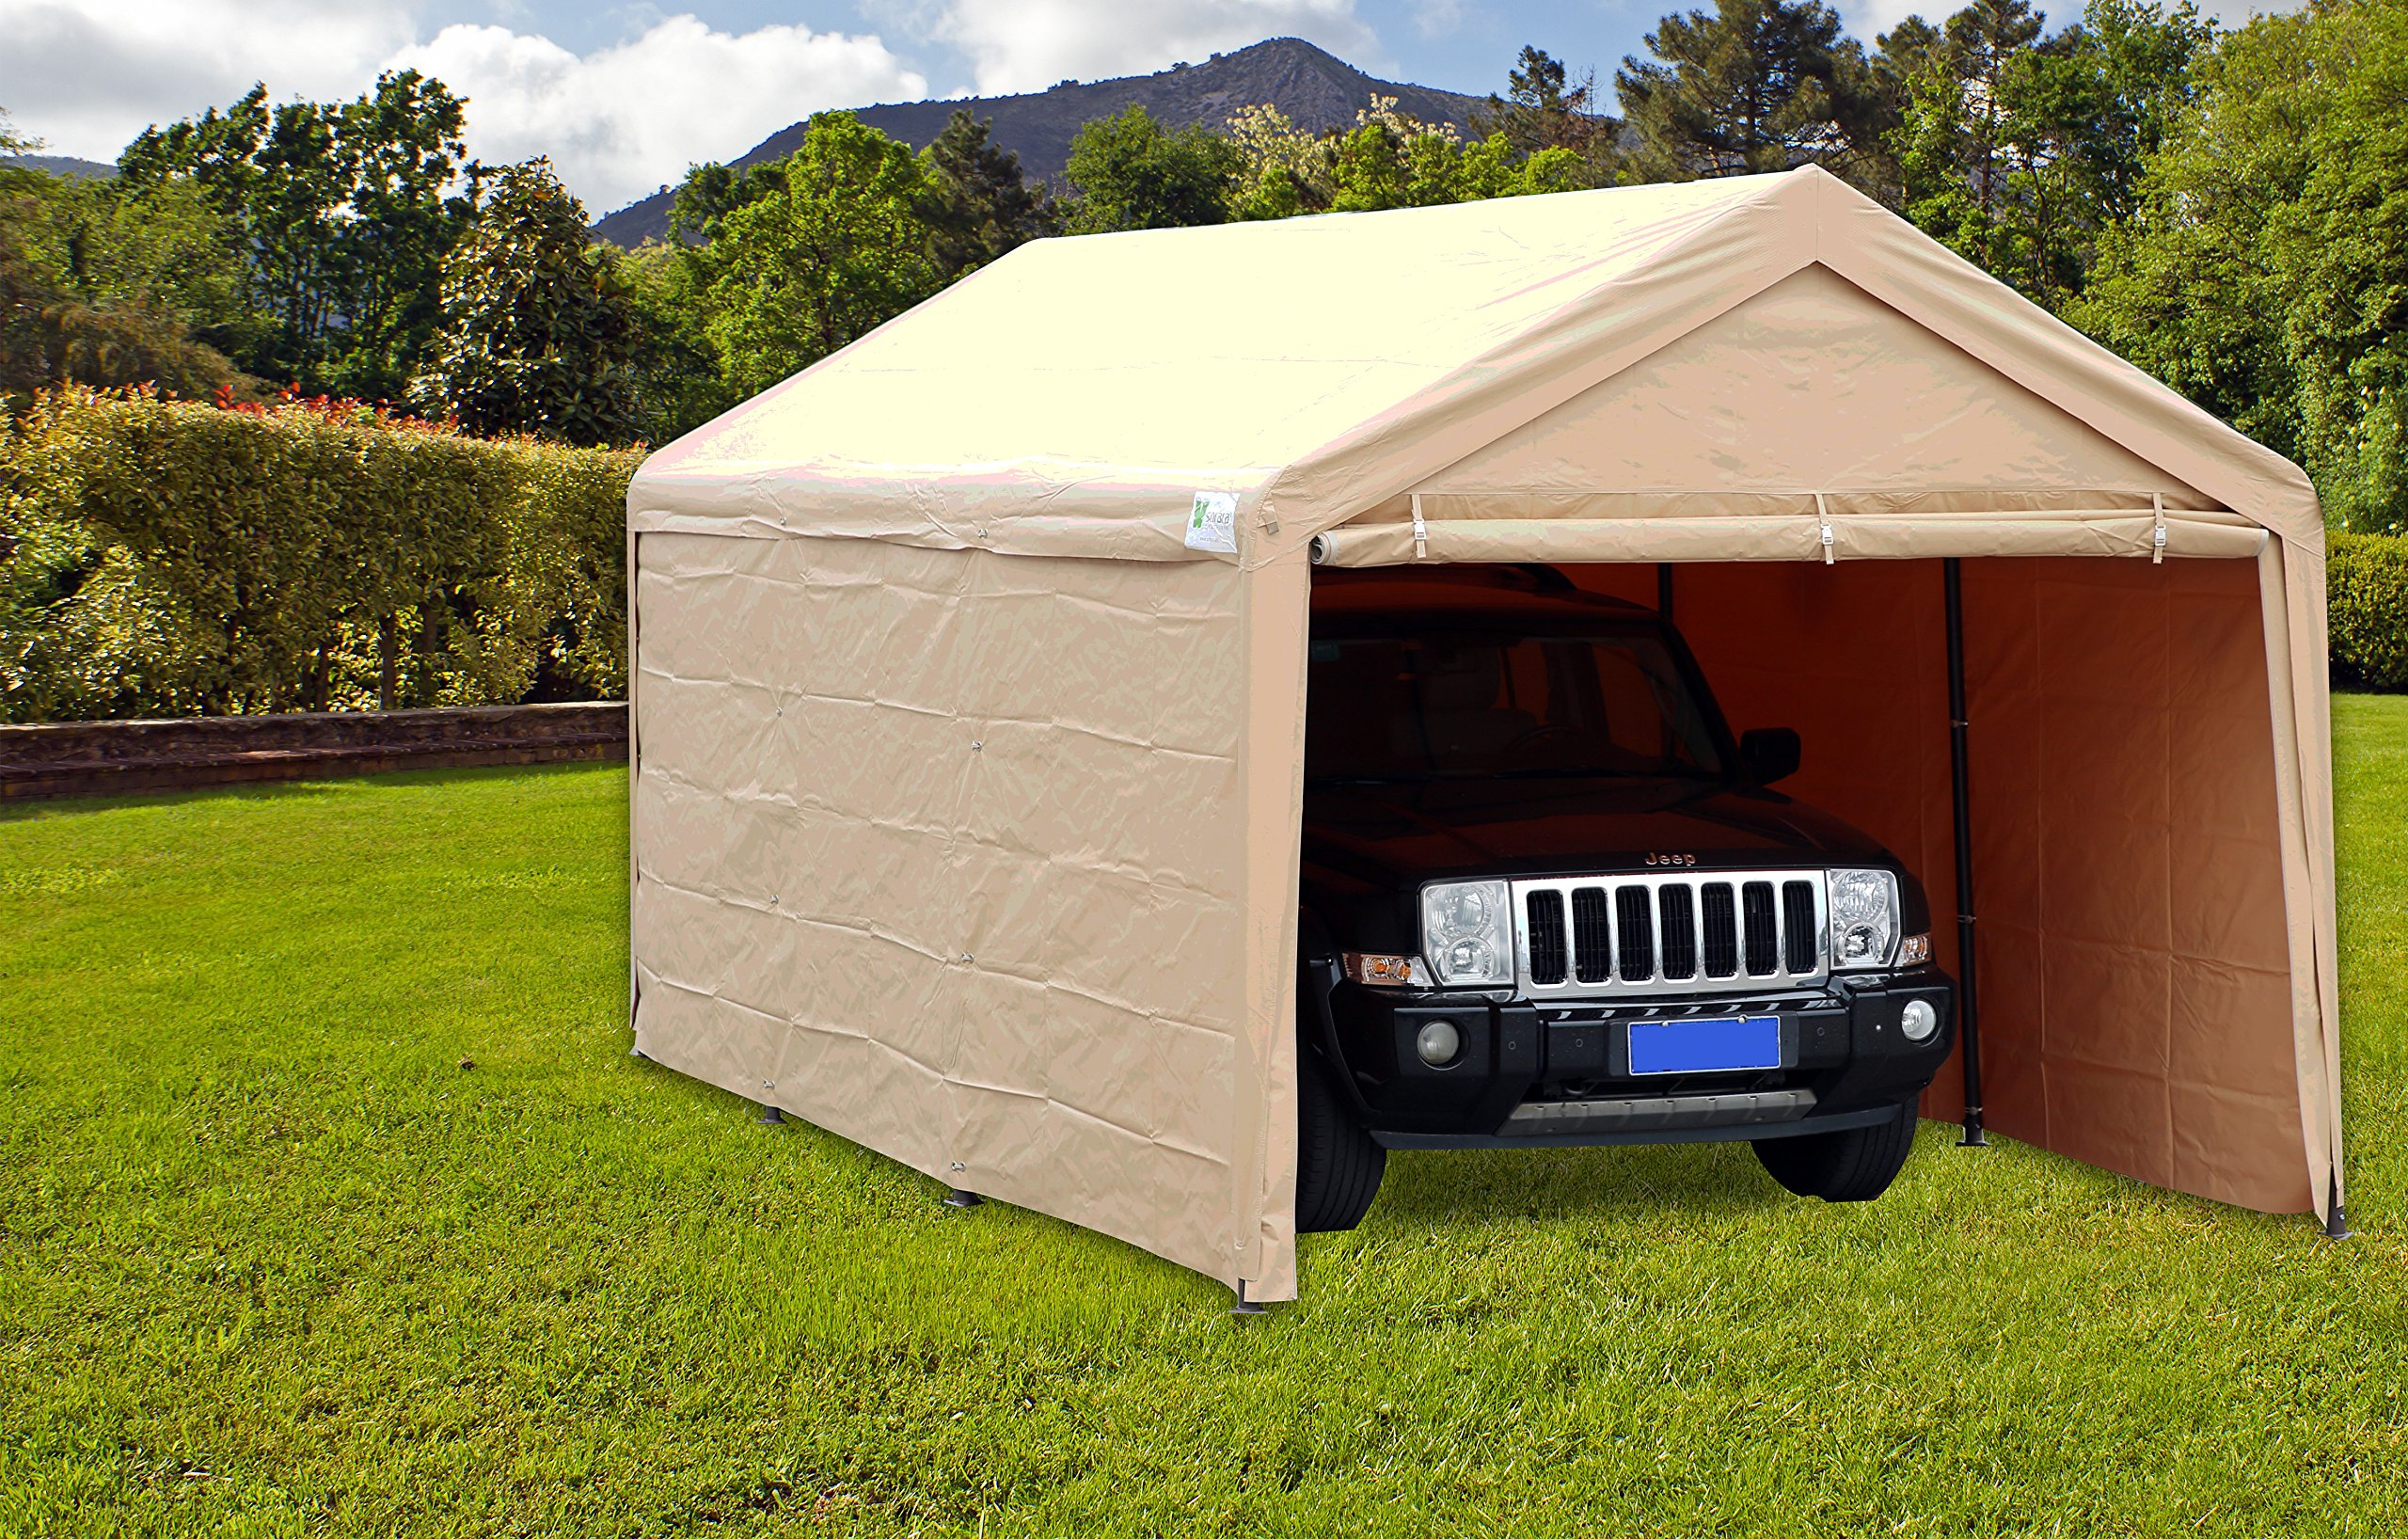 SORARA Carport 10' x 20' Heavy Duty Outdoor Car Canopy Garage Storage Shelter with Detachable Sidewalls, Beige by SORARA